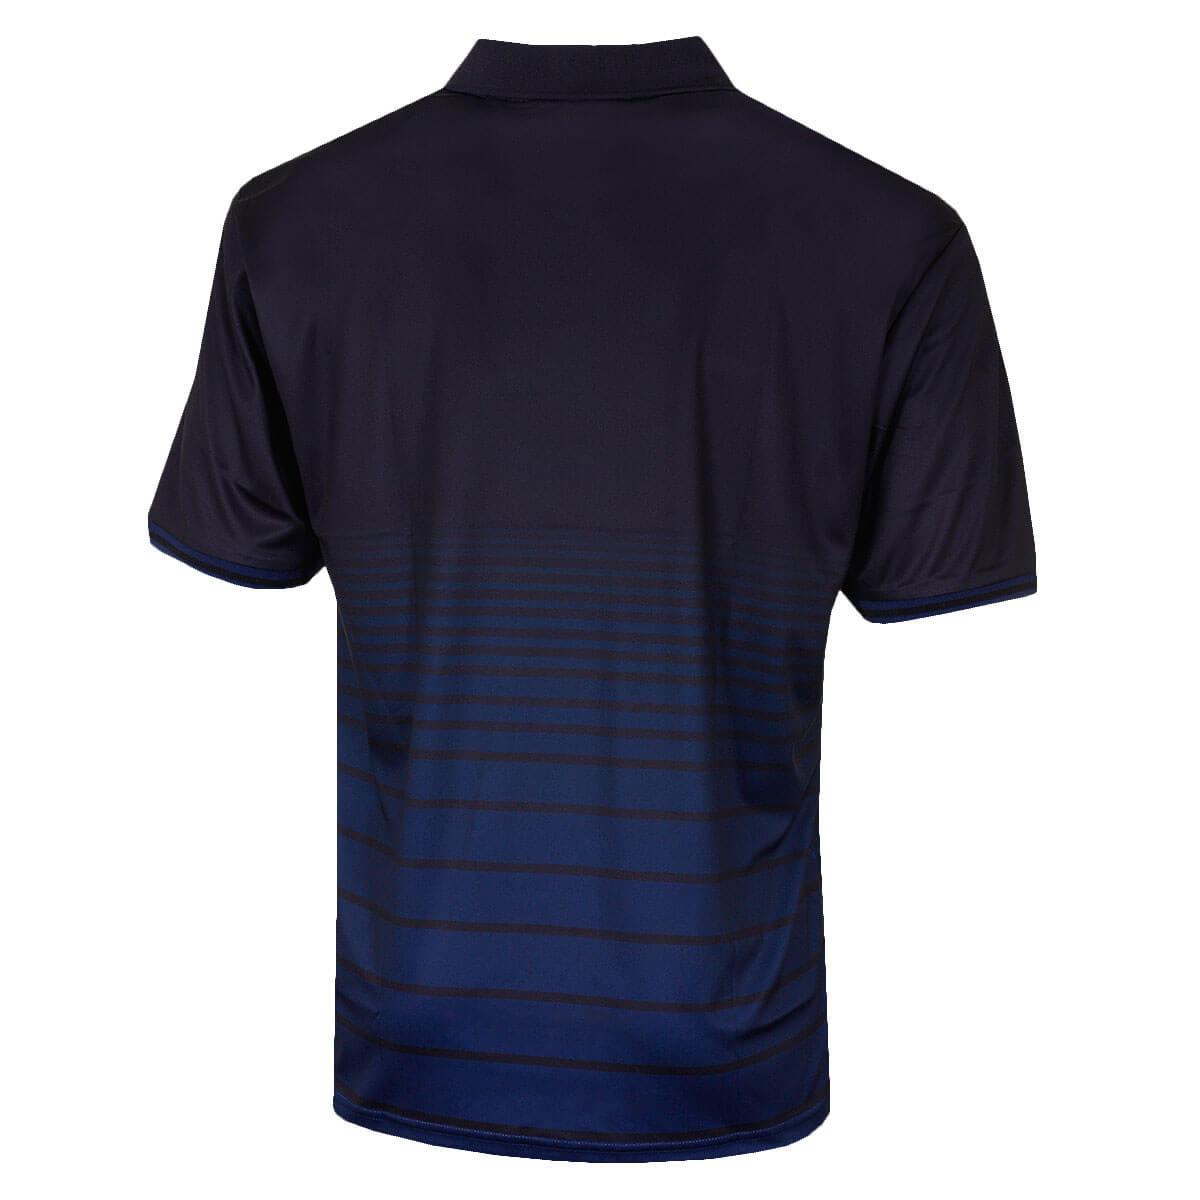 Island-Green-Mens-2019-Golf-1890-Sublimated-Stripe-Logo-Polo-Shirt-43-OFF-RRP thumbnail 5